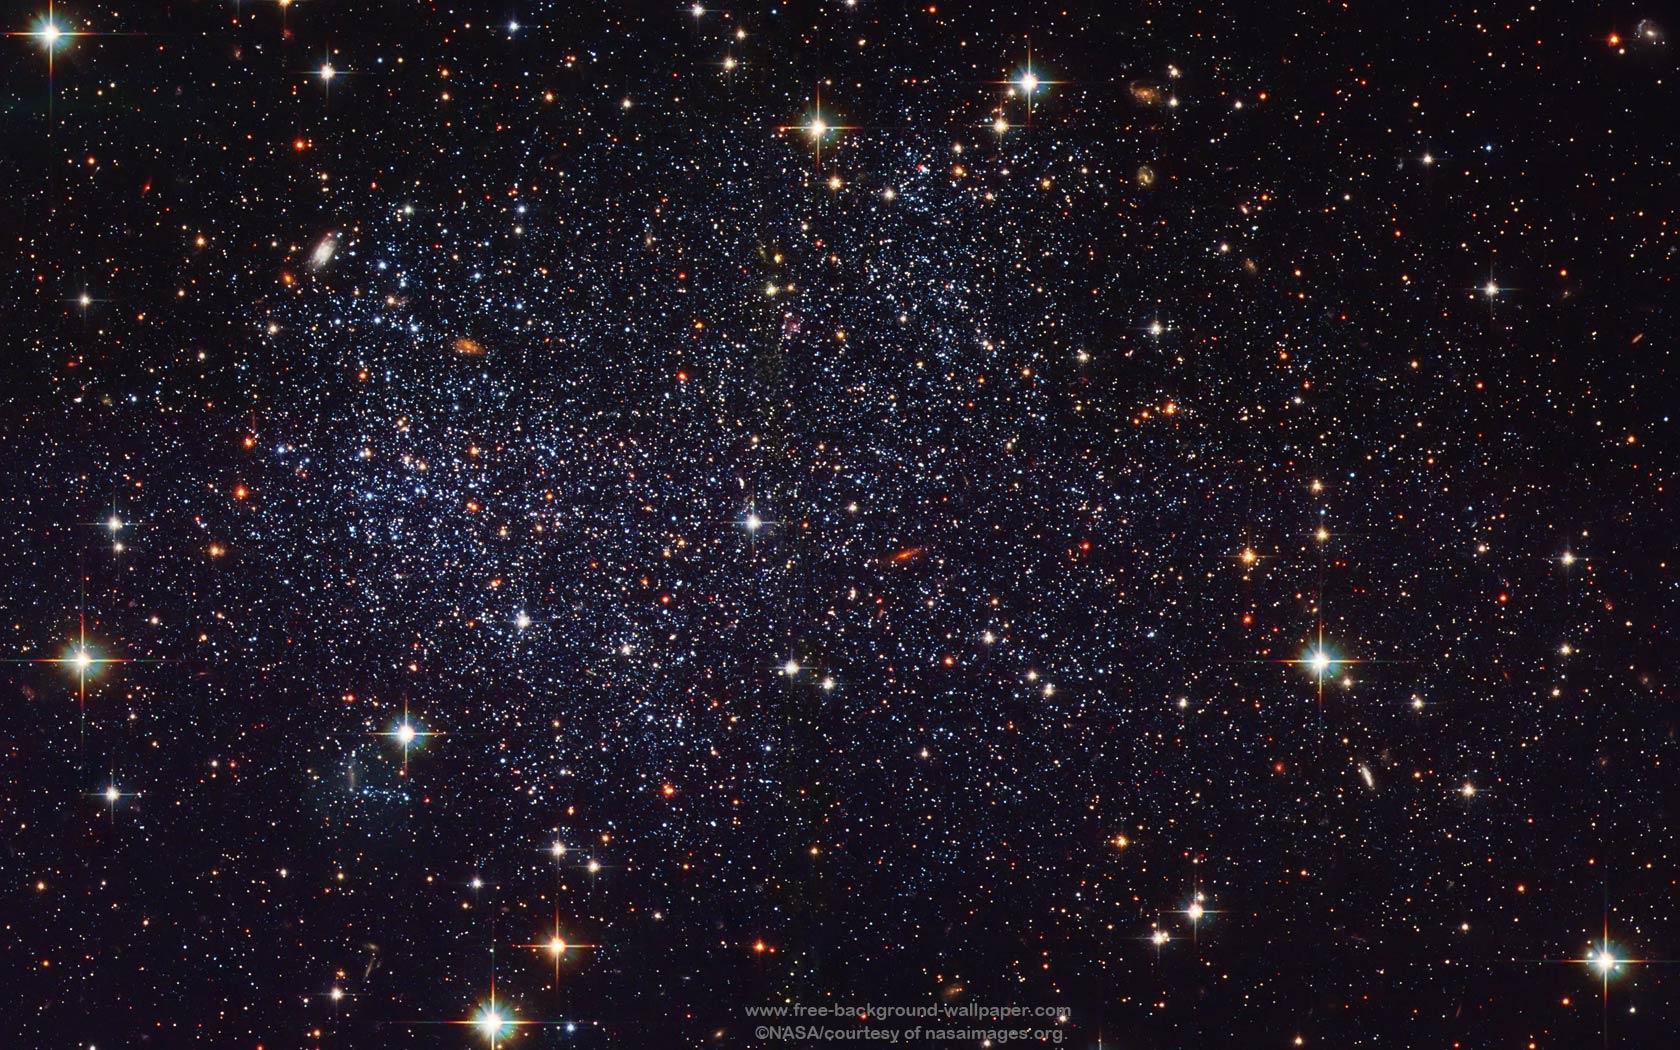 Galaxy Constellation Wallpaper   Stars Background Wallpaper 1680x1050